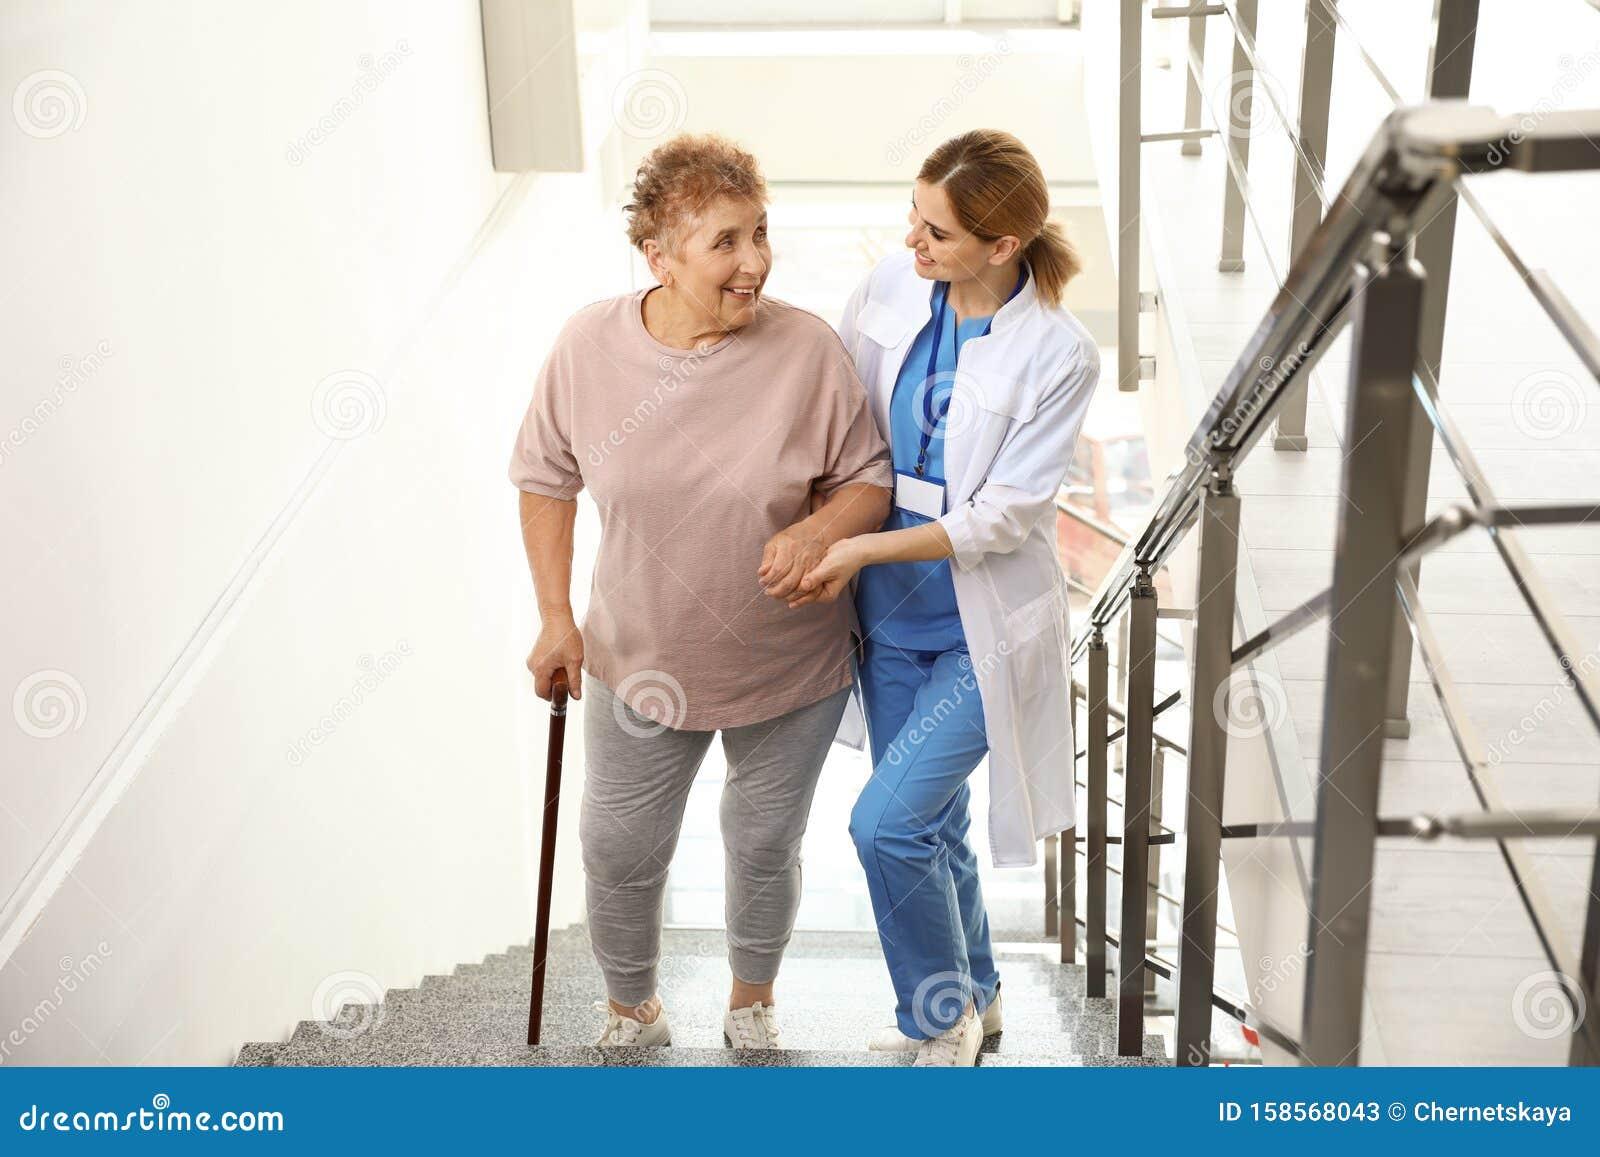 Nurse assisting elderly woman on stairs